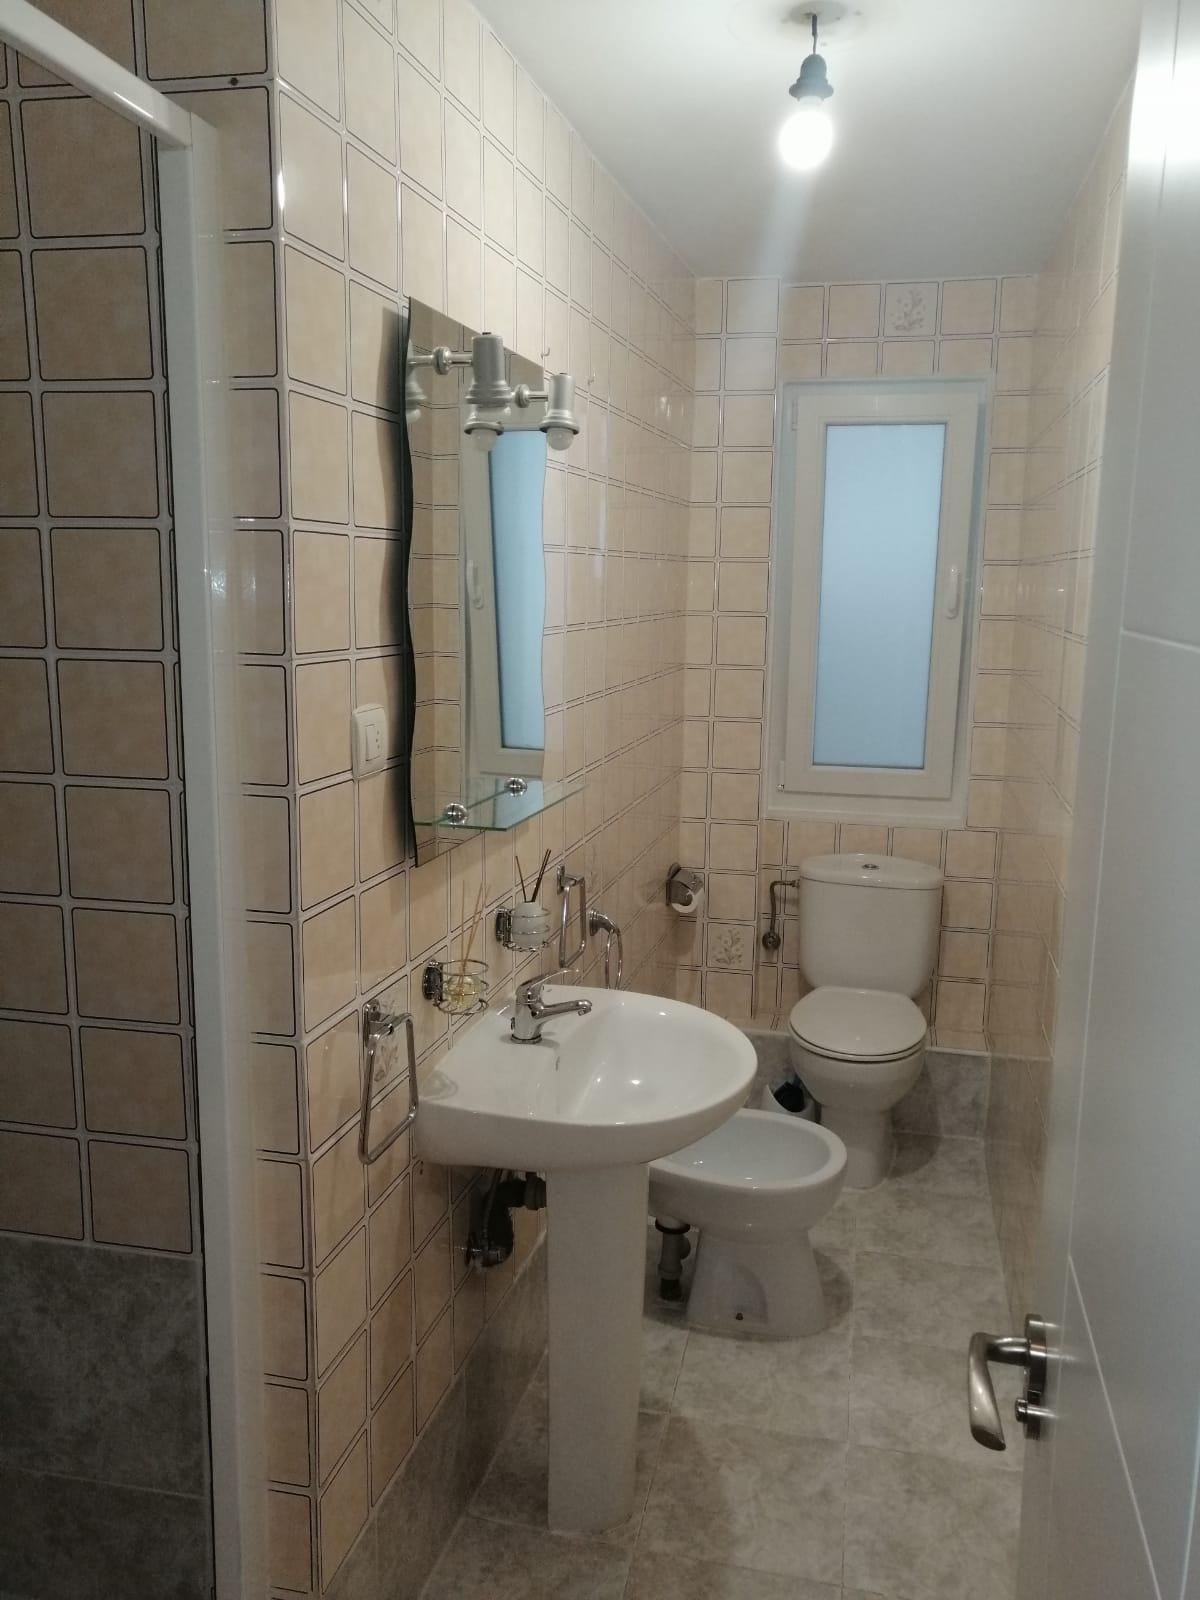 Piso de tres dormitorios junto a corte inglés (REF: 53) - foto 5 f595da76-5f5b-4631-baf2-b92e212ce1e9.jpg